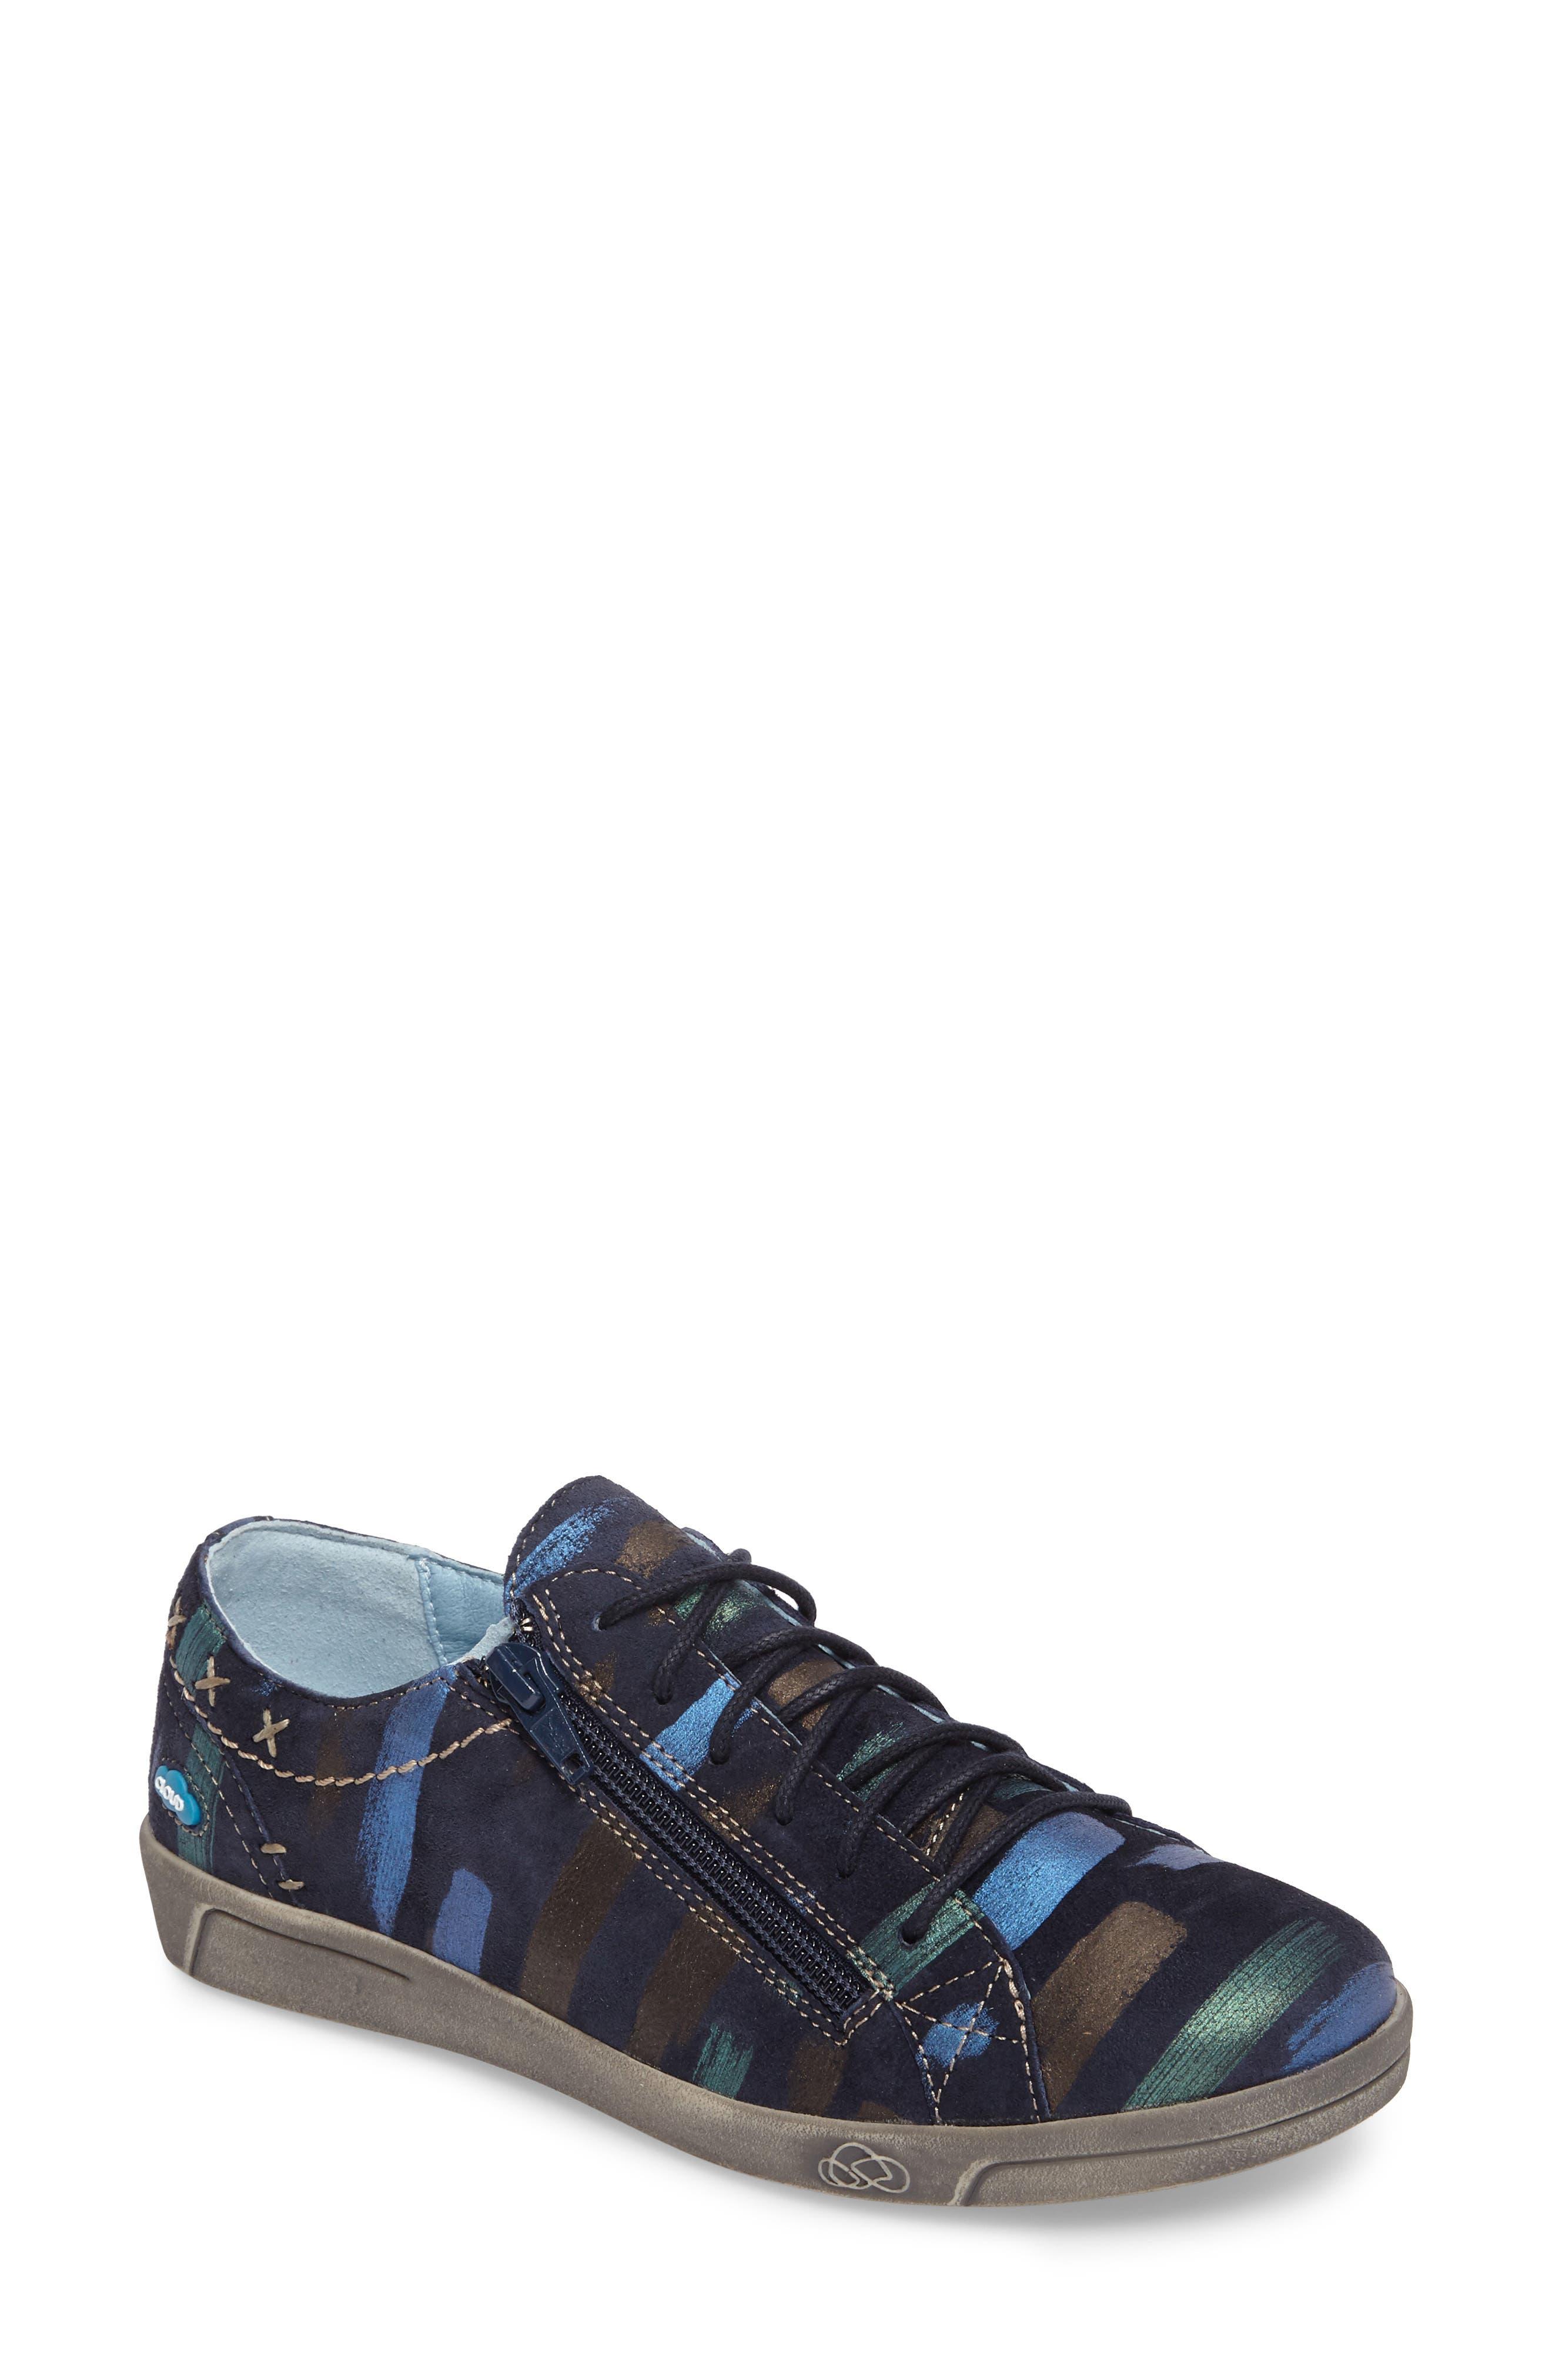 Alternate Image 1 Selected - CLOUD 'Aika' Leather Sneaker (Women)